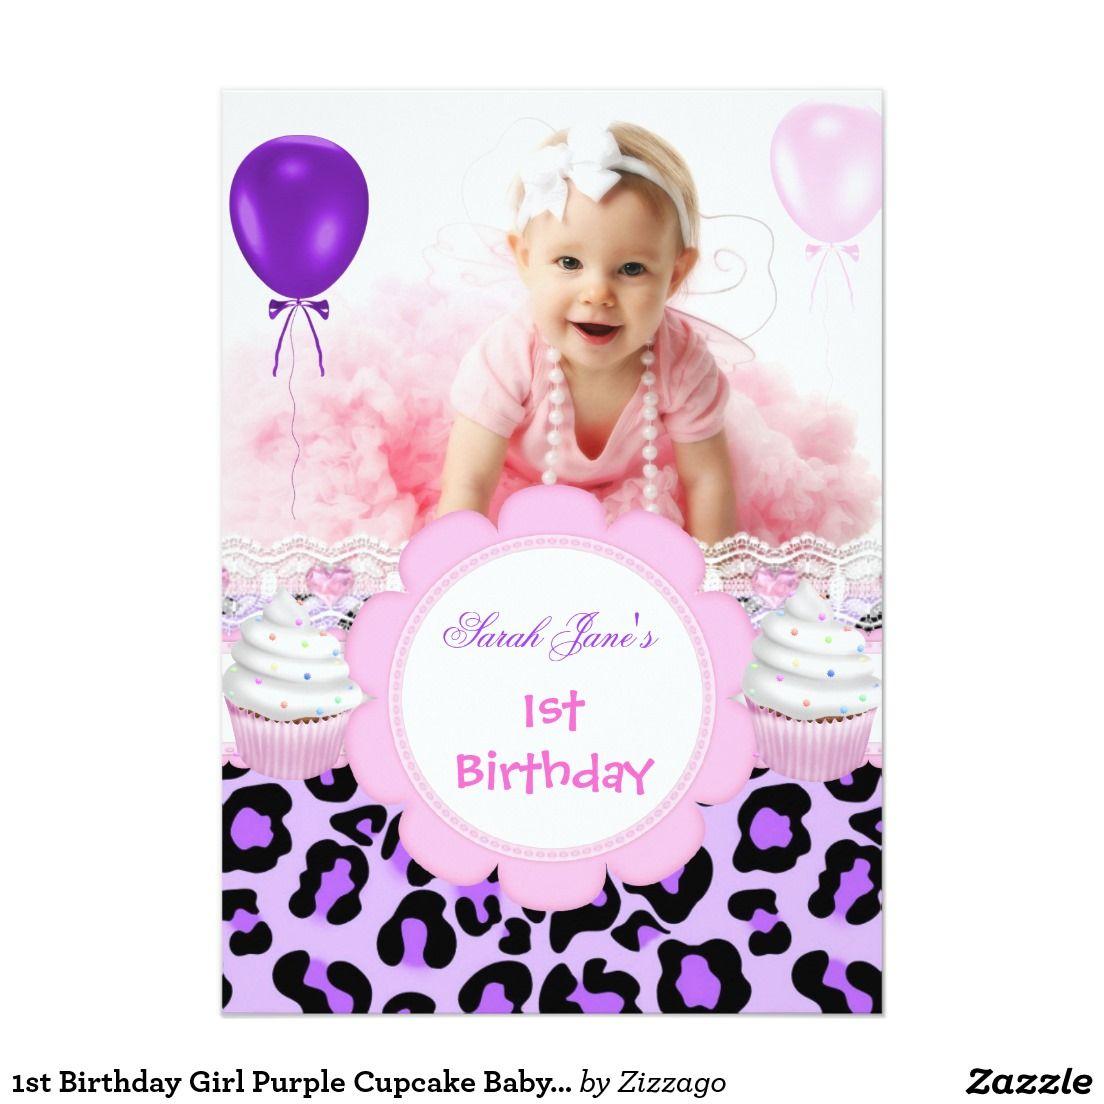 1st birthday girl purple cupcake baby leopard 5 x 7 invitation 1st birthday girl purple cupcake baby leopard 5 x 7 invitation card filmwisefo Image collections